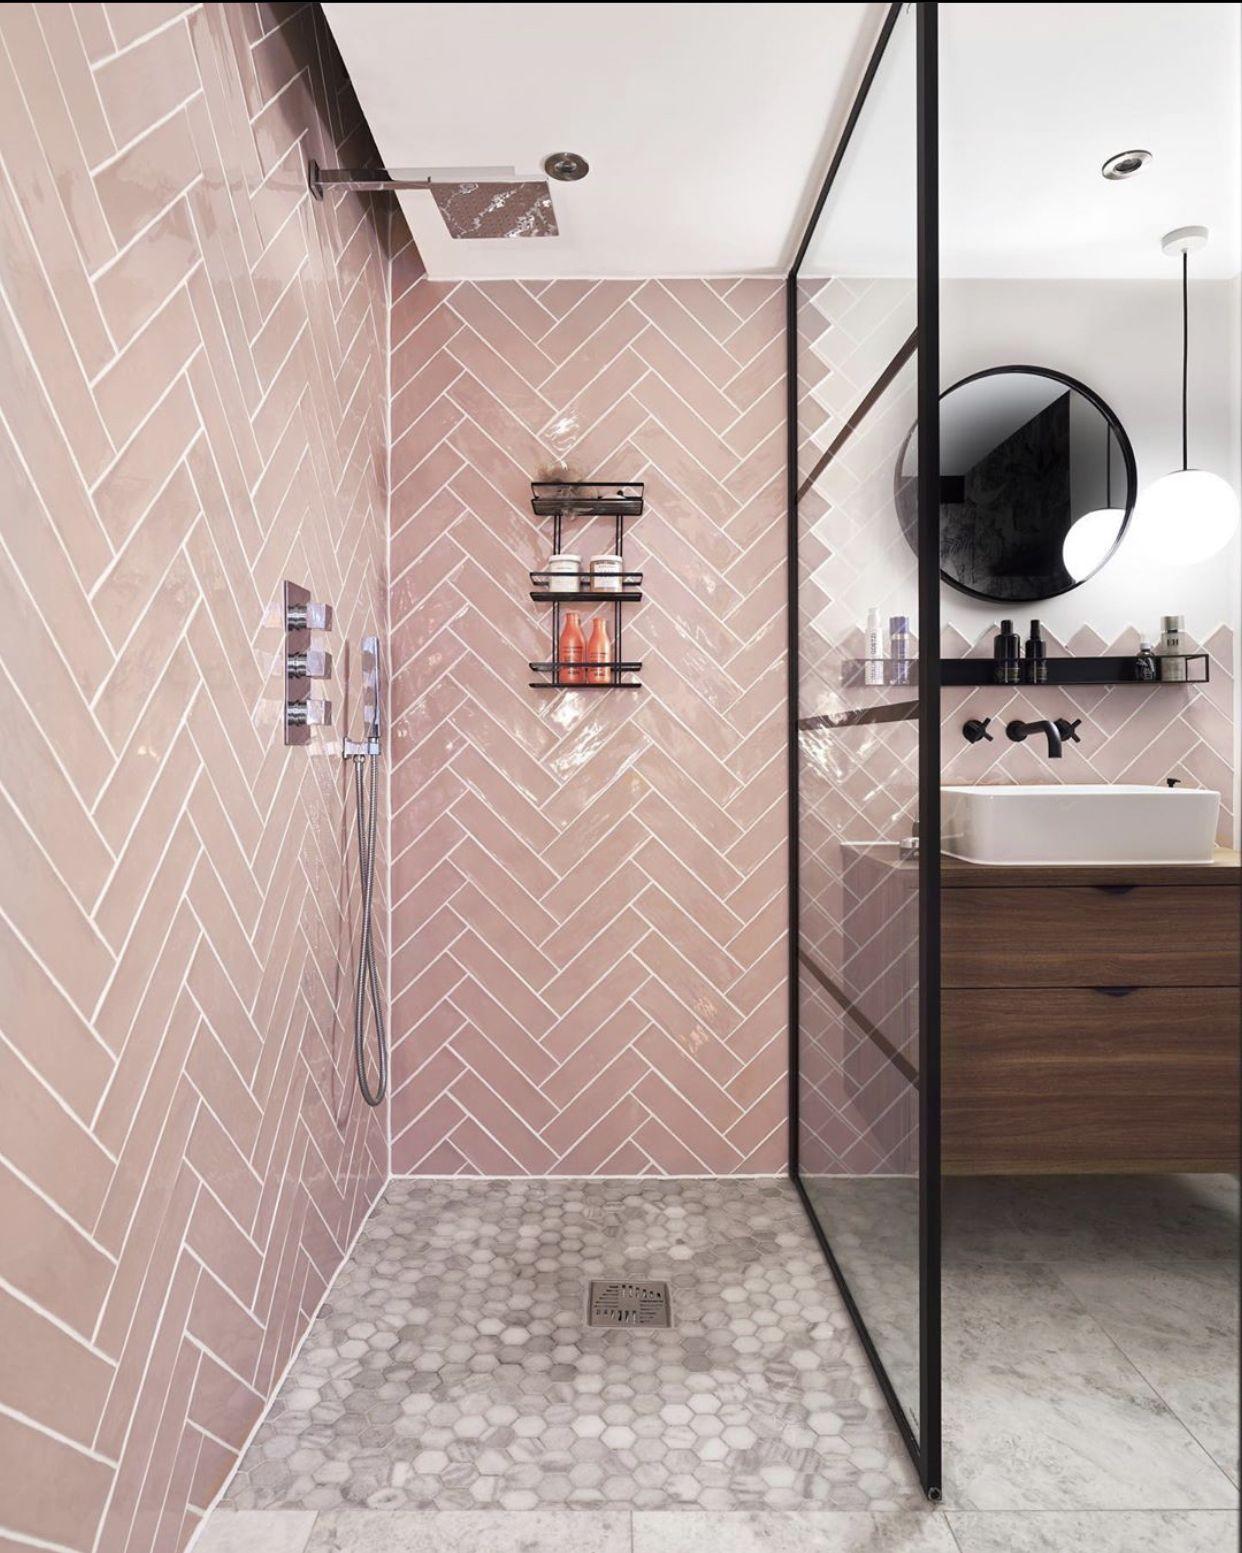 Pin By Laura Vom Stein On Bathroom In 2020 Bathroom Interior Design Bathroom Interior Mobile Home Bathrooms